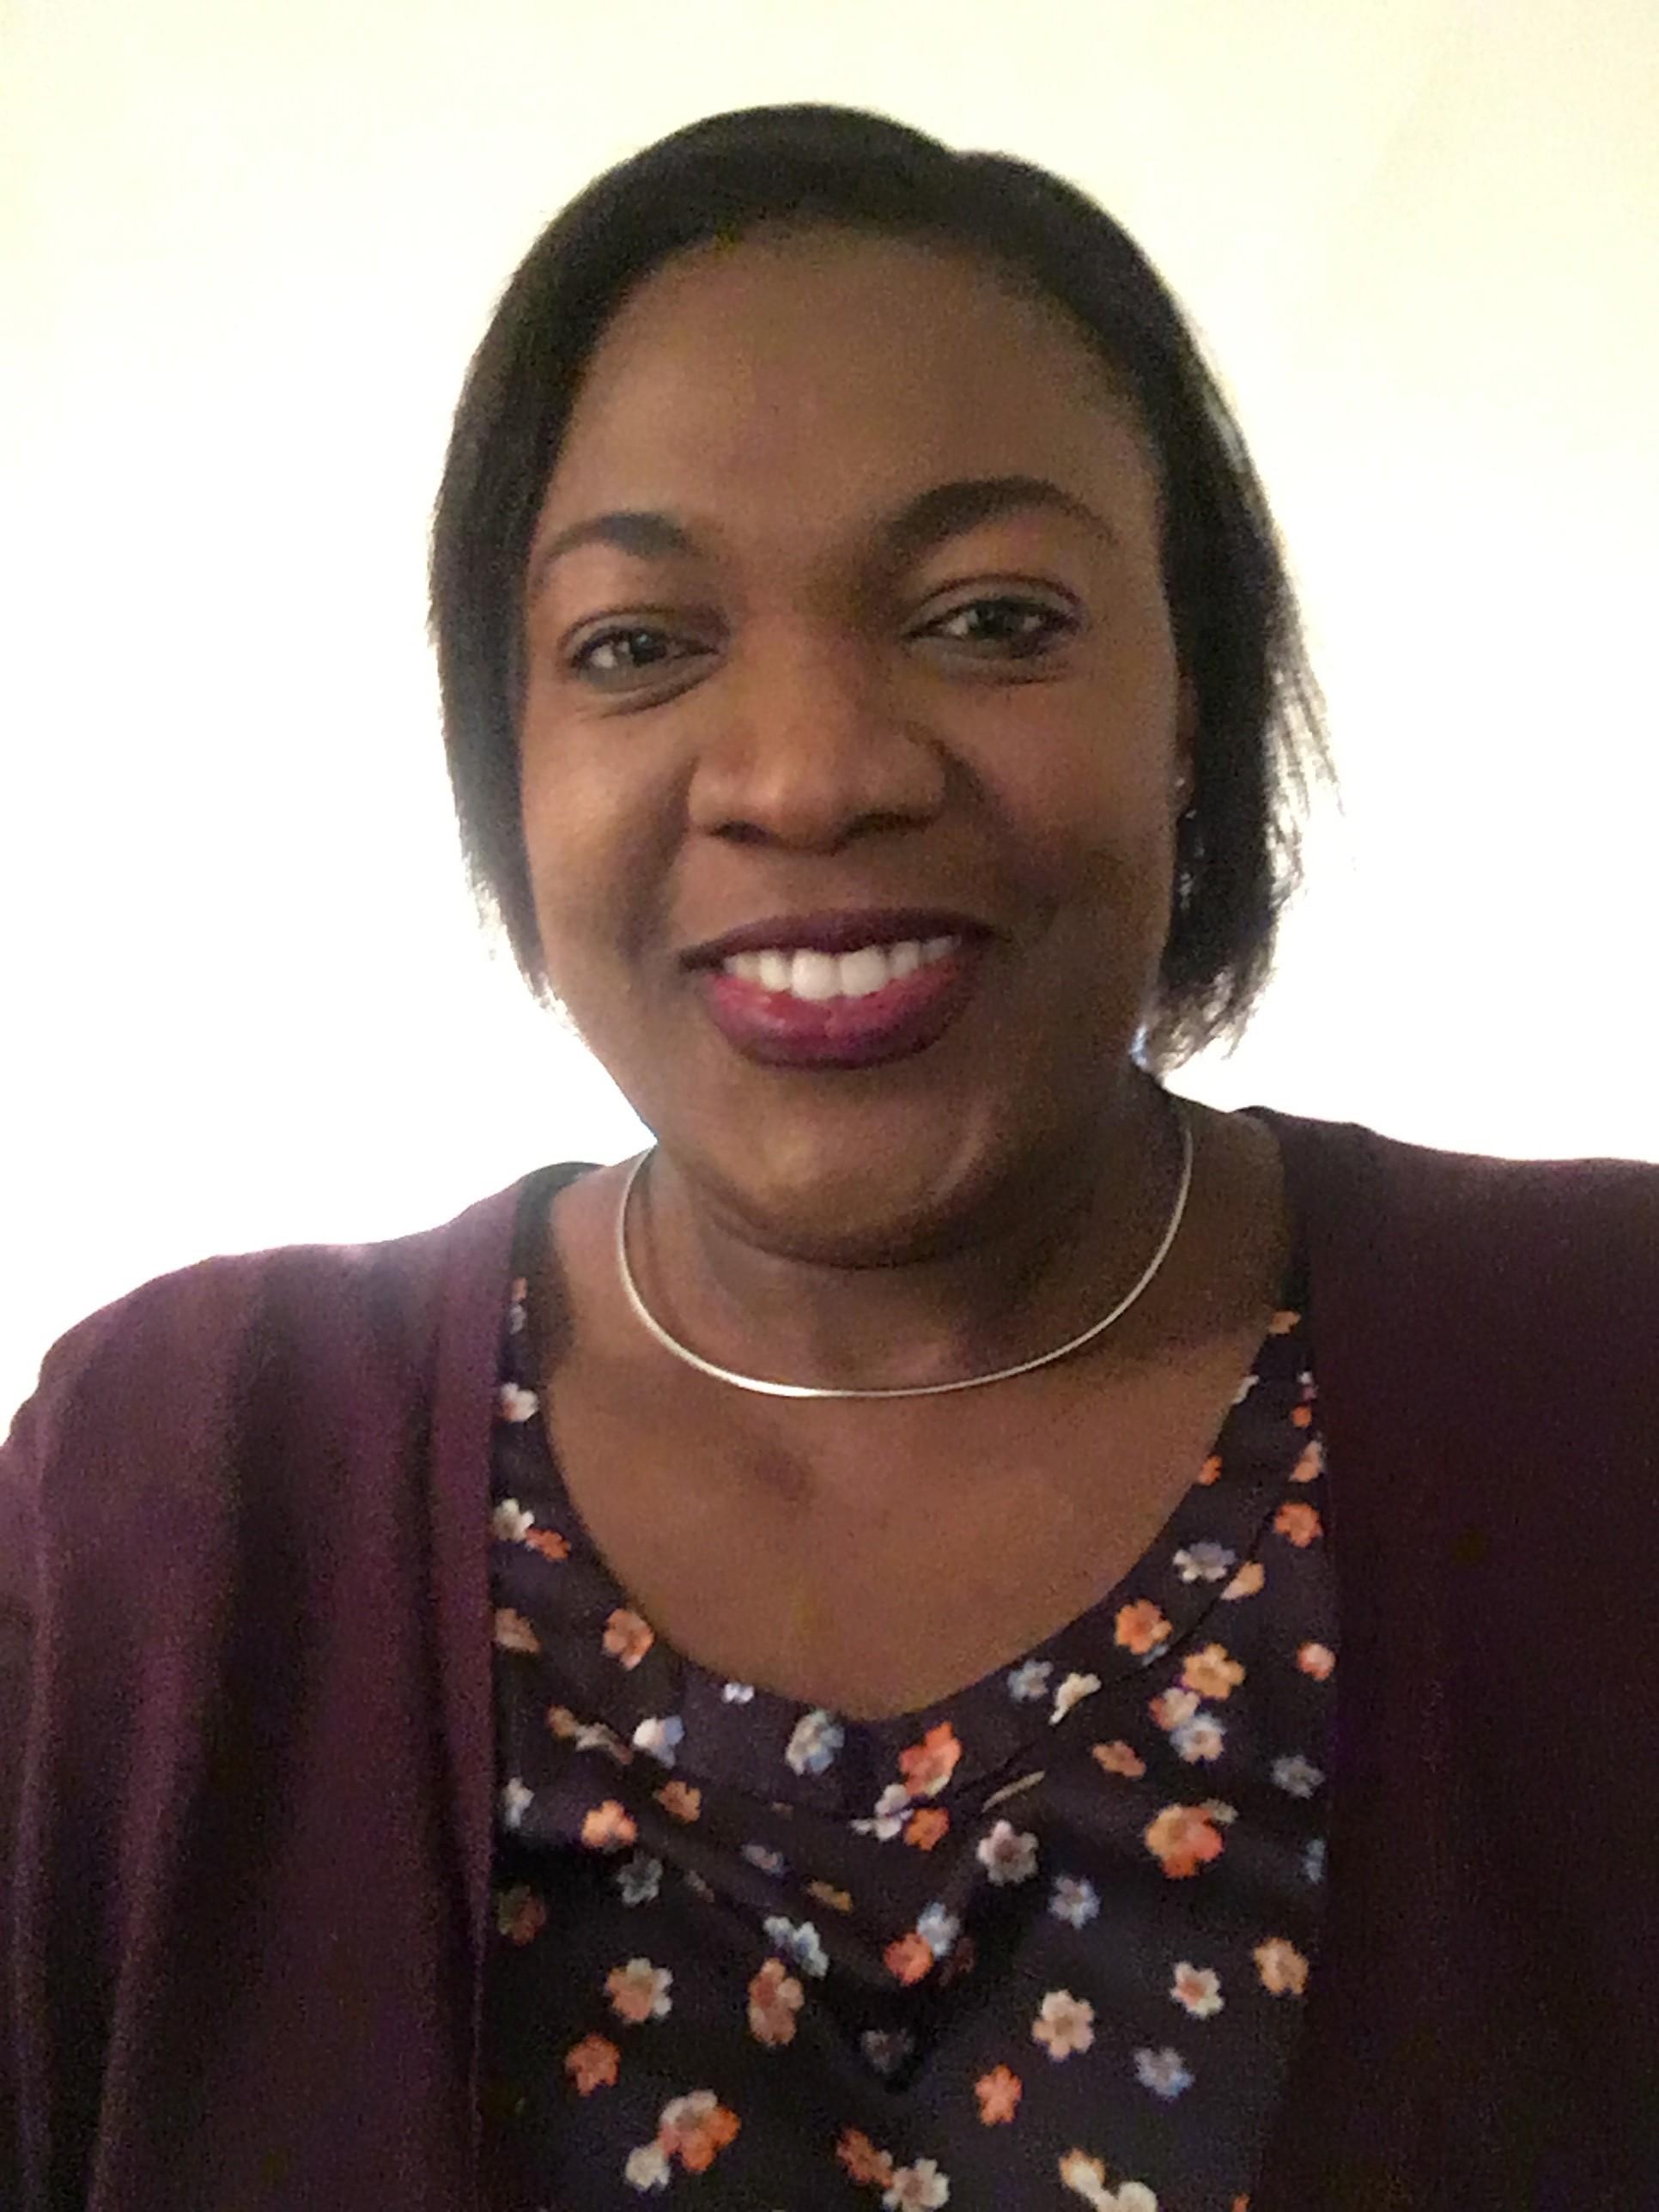 Sheri Dosunmu - Governement de l'Ontario